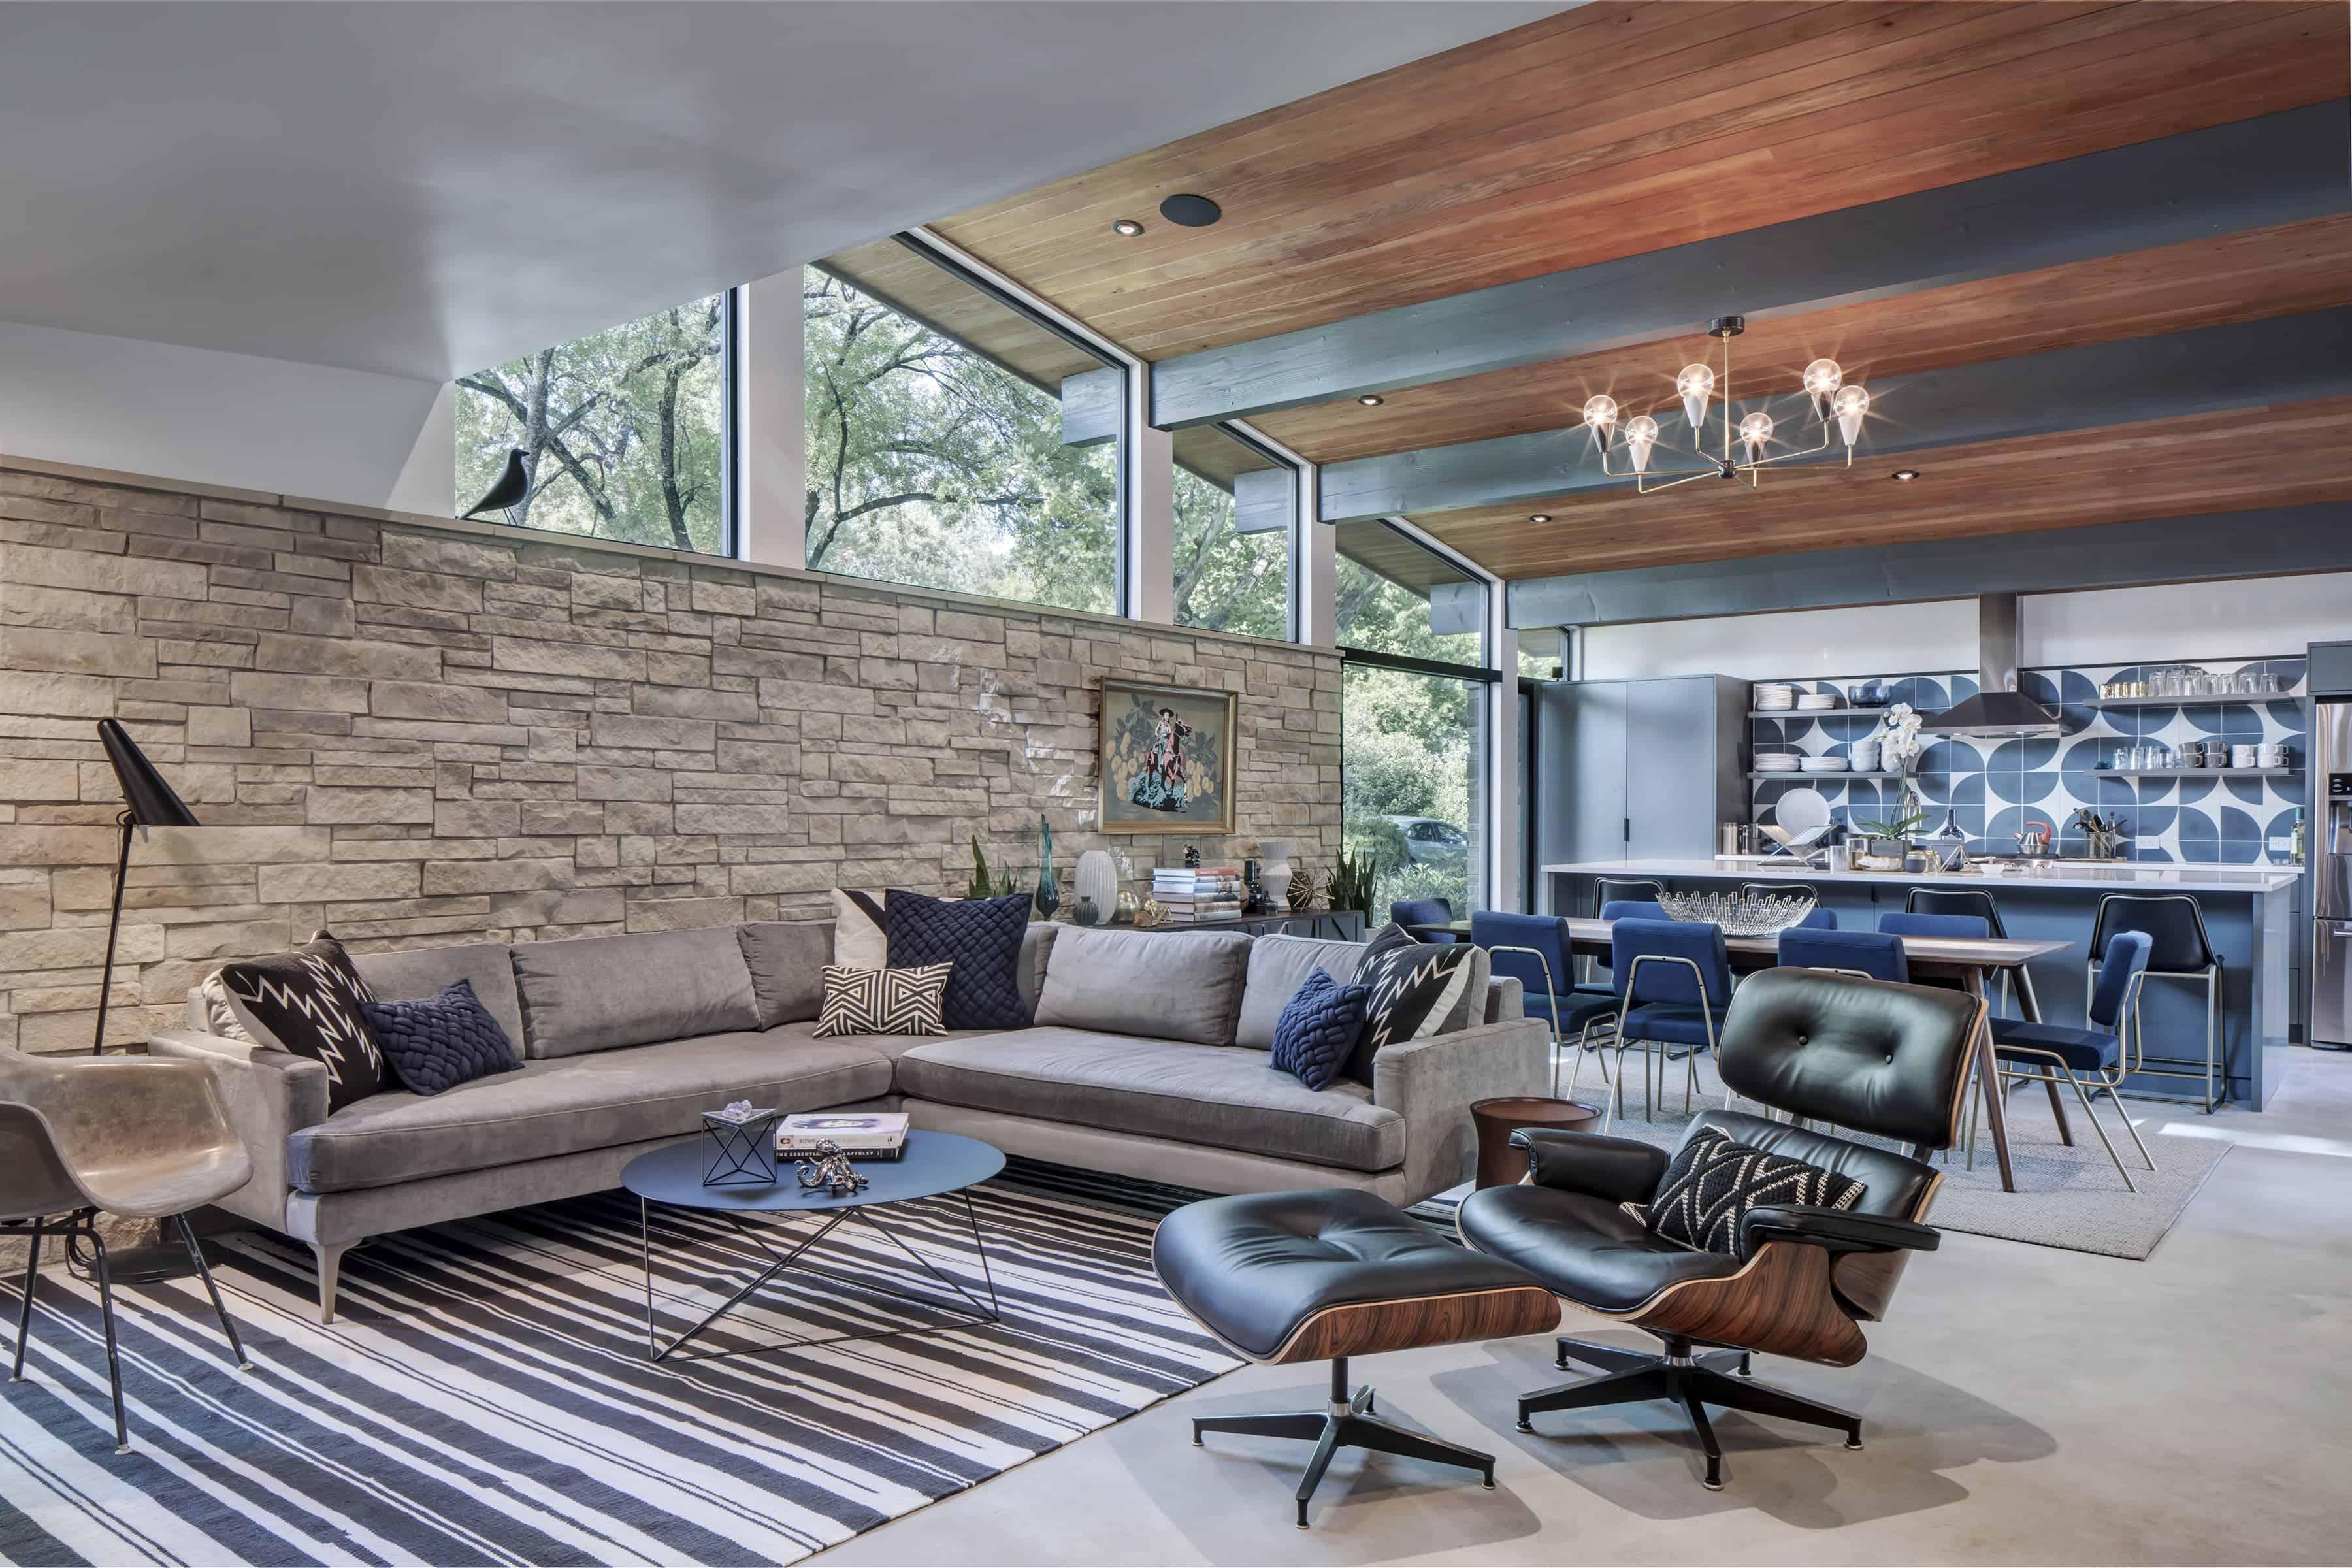 Living area in the Re-Open House designed by Matt Fajkus Architecture.